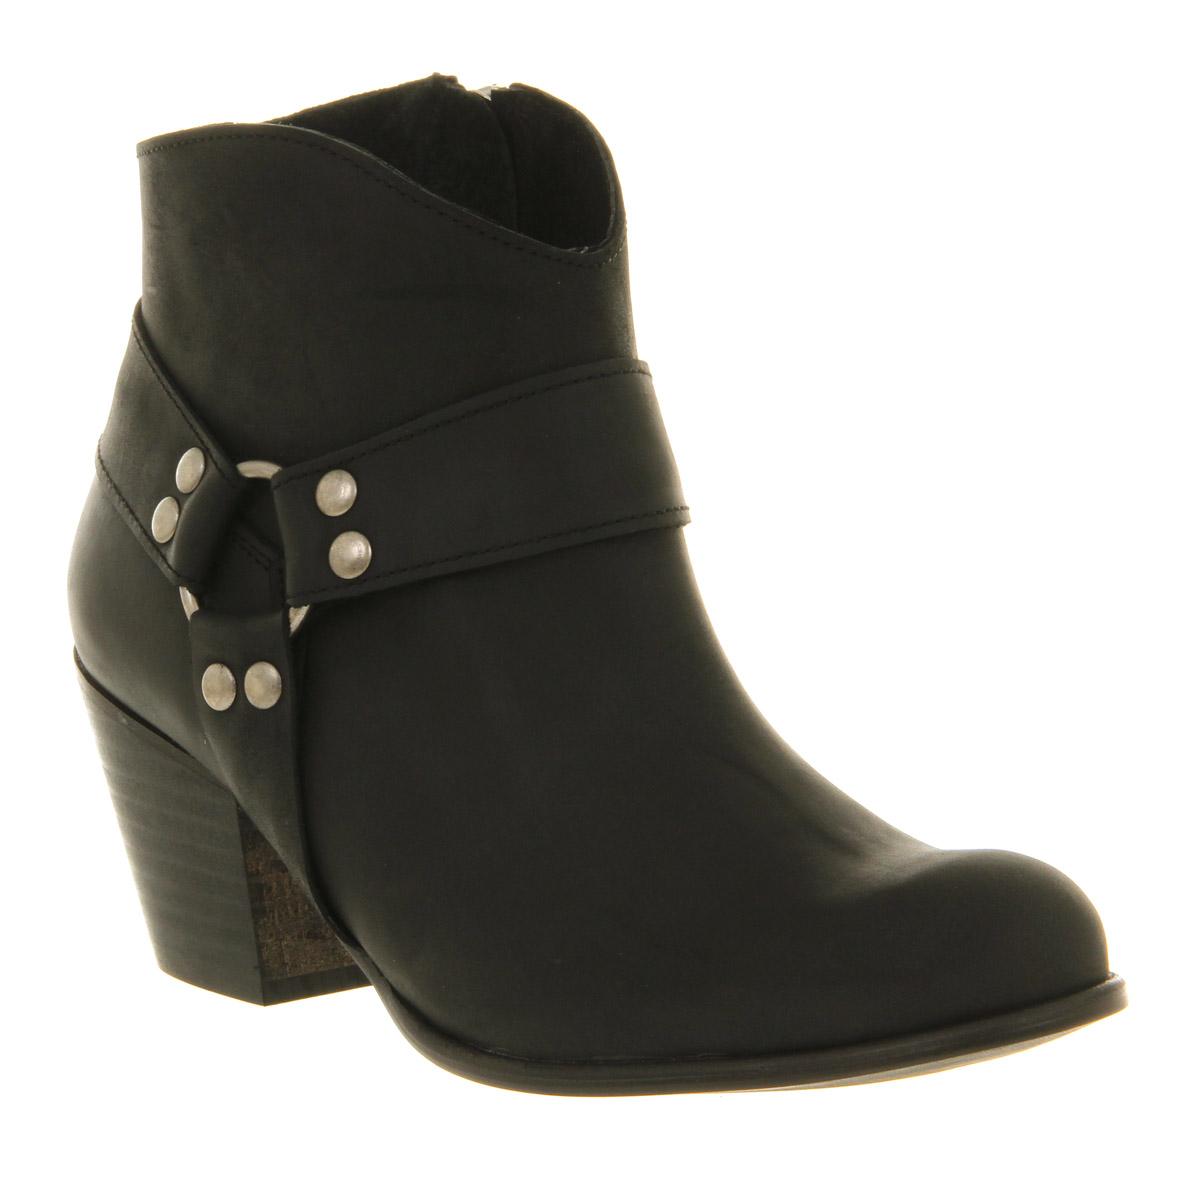 Creative Home Gt Women39s Gt Women39s Western Boots Amp Shoes Gt Womens